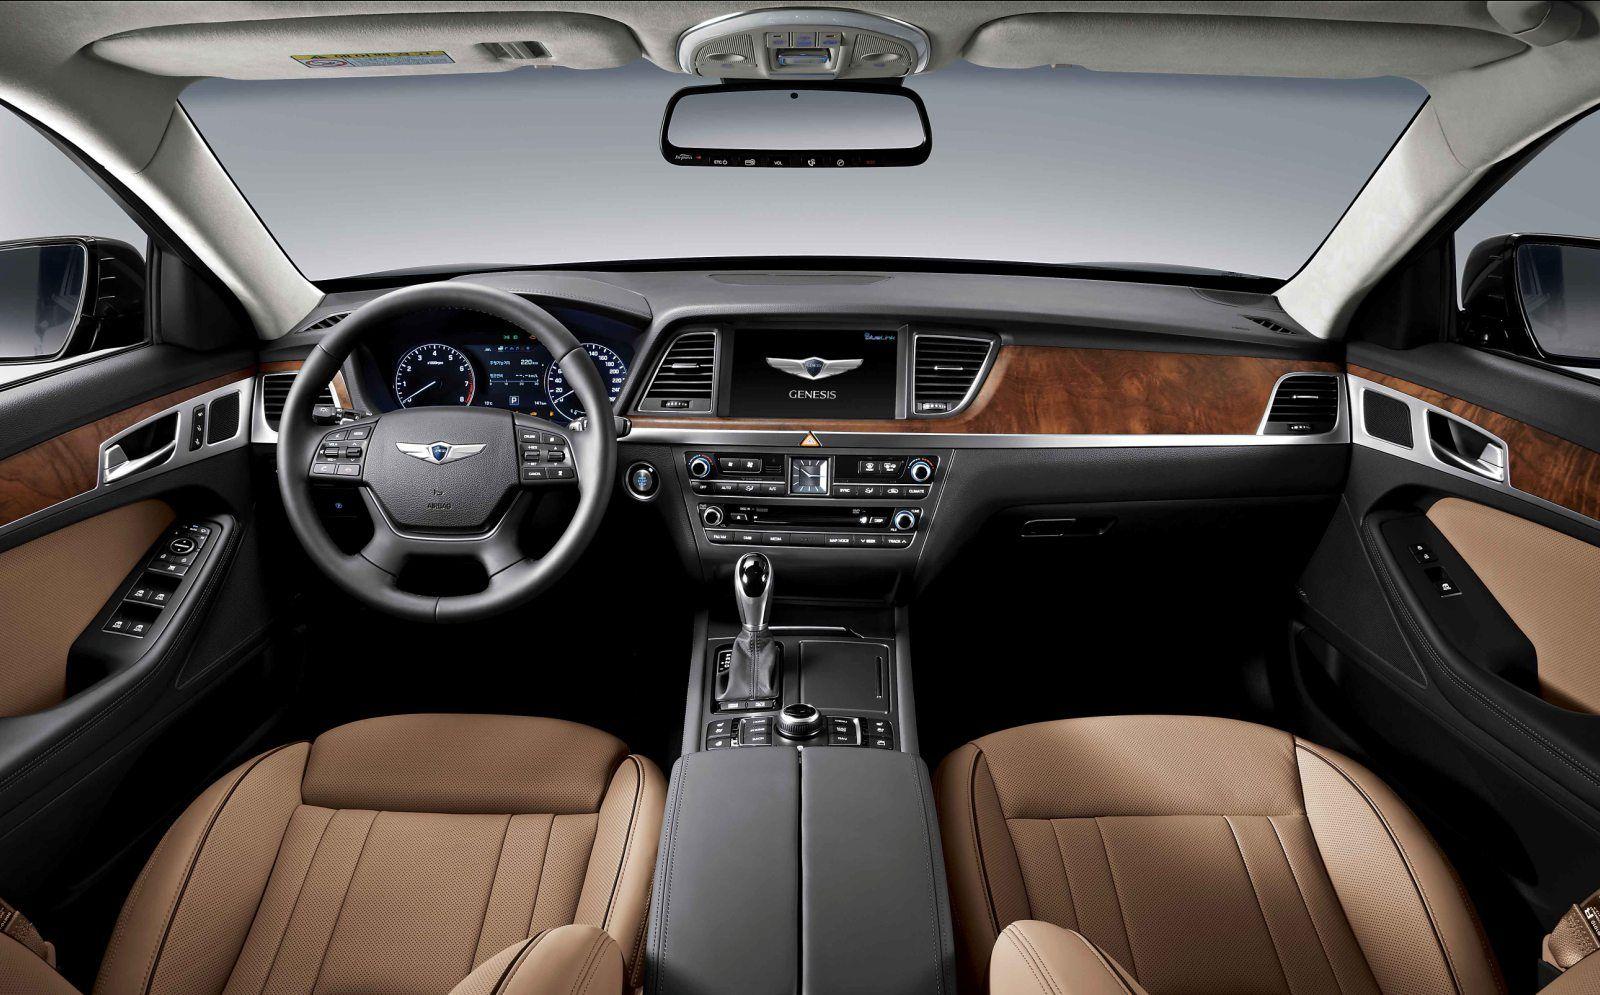 Hyundai Genesis 5.0 R Spec Sport Sedan   MUST READ: 2014 Hyundai Veloster  Turbo